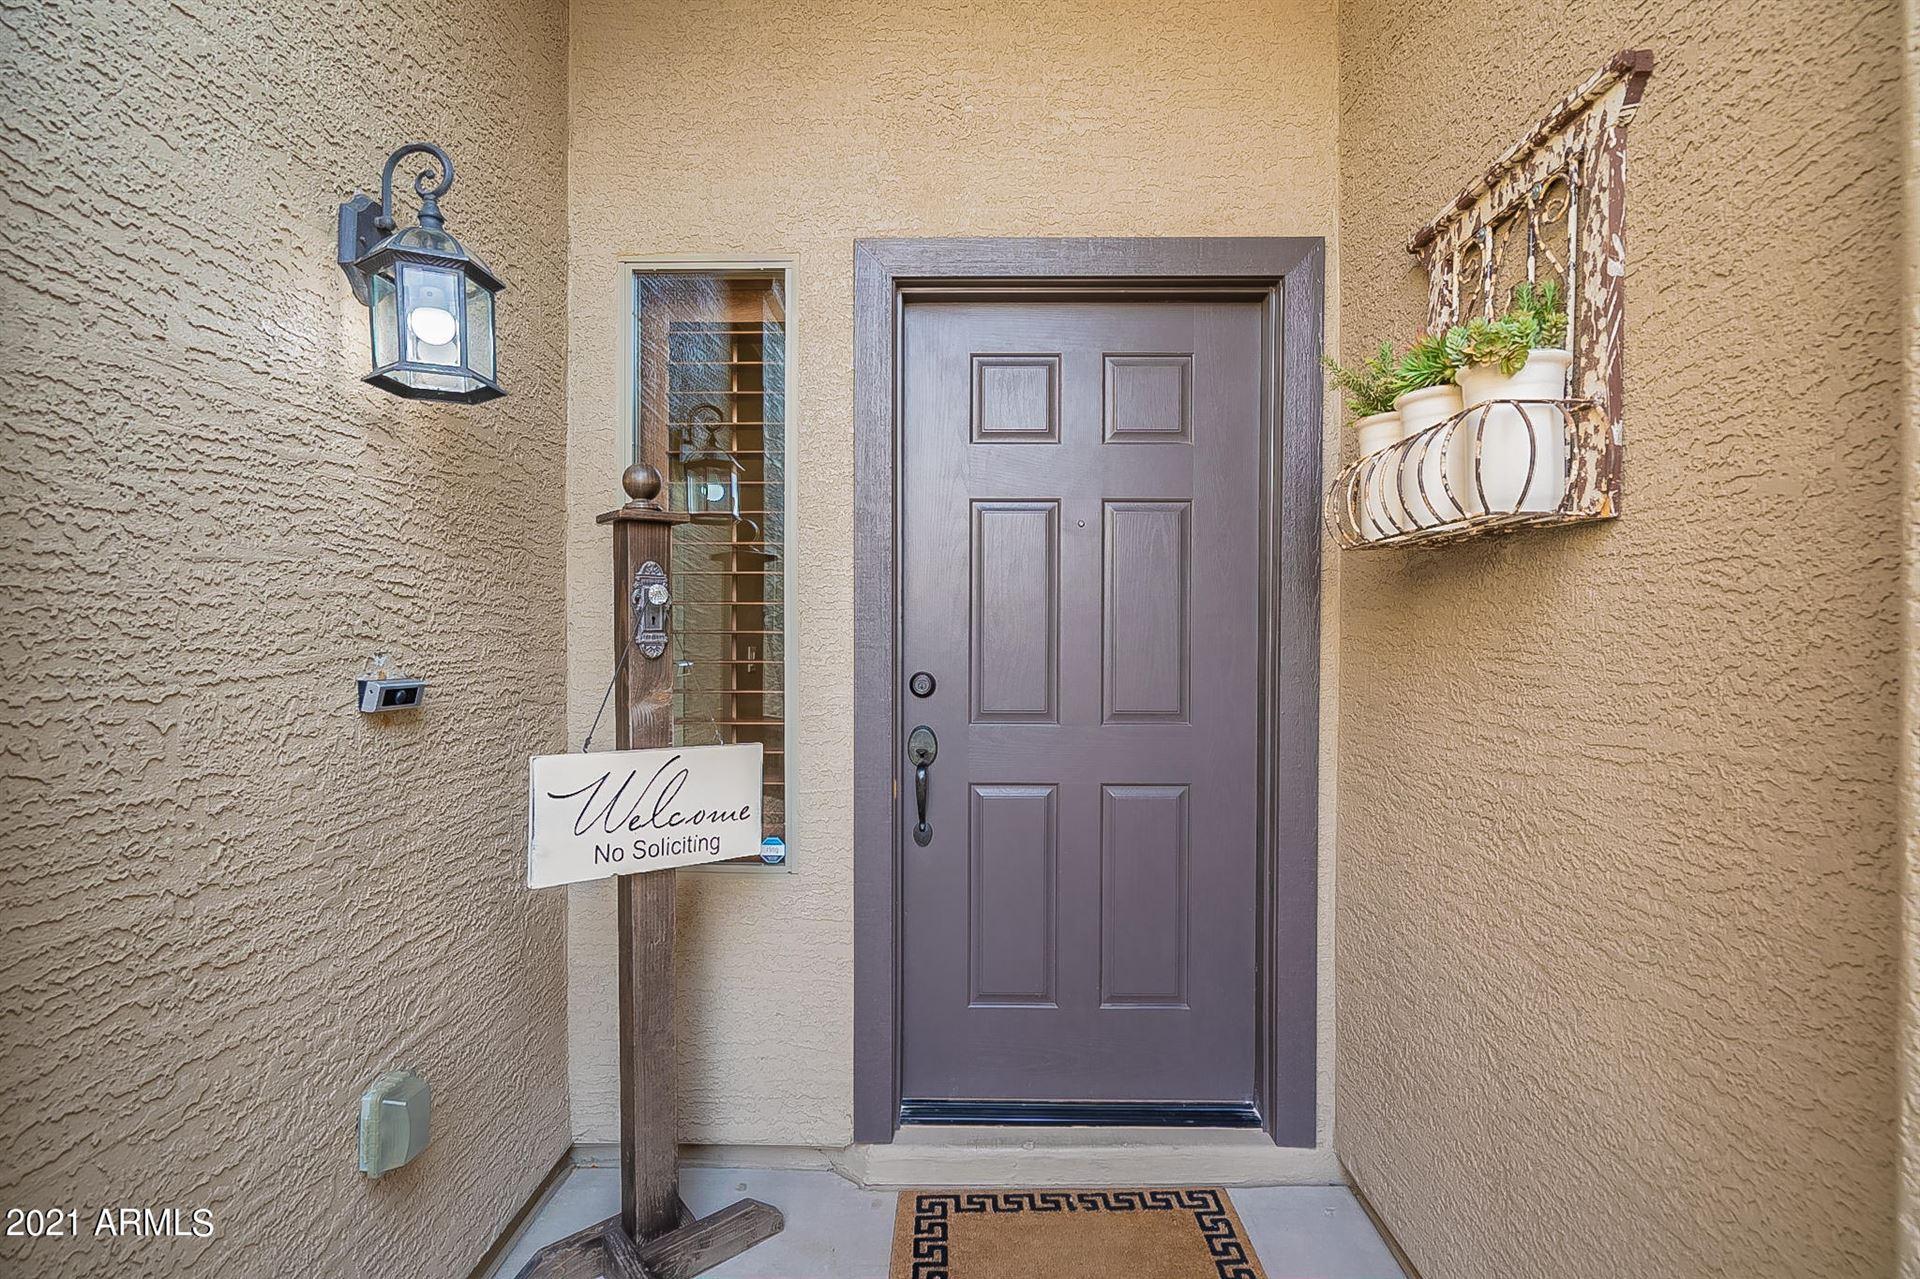 Photo of 1767 W AGRARIAN HILLS Drive, Queen Creek, AZ 85142 (MLS # 6268244)